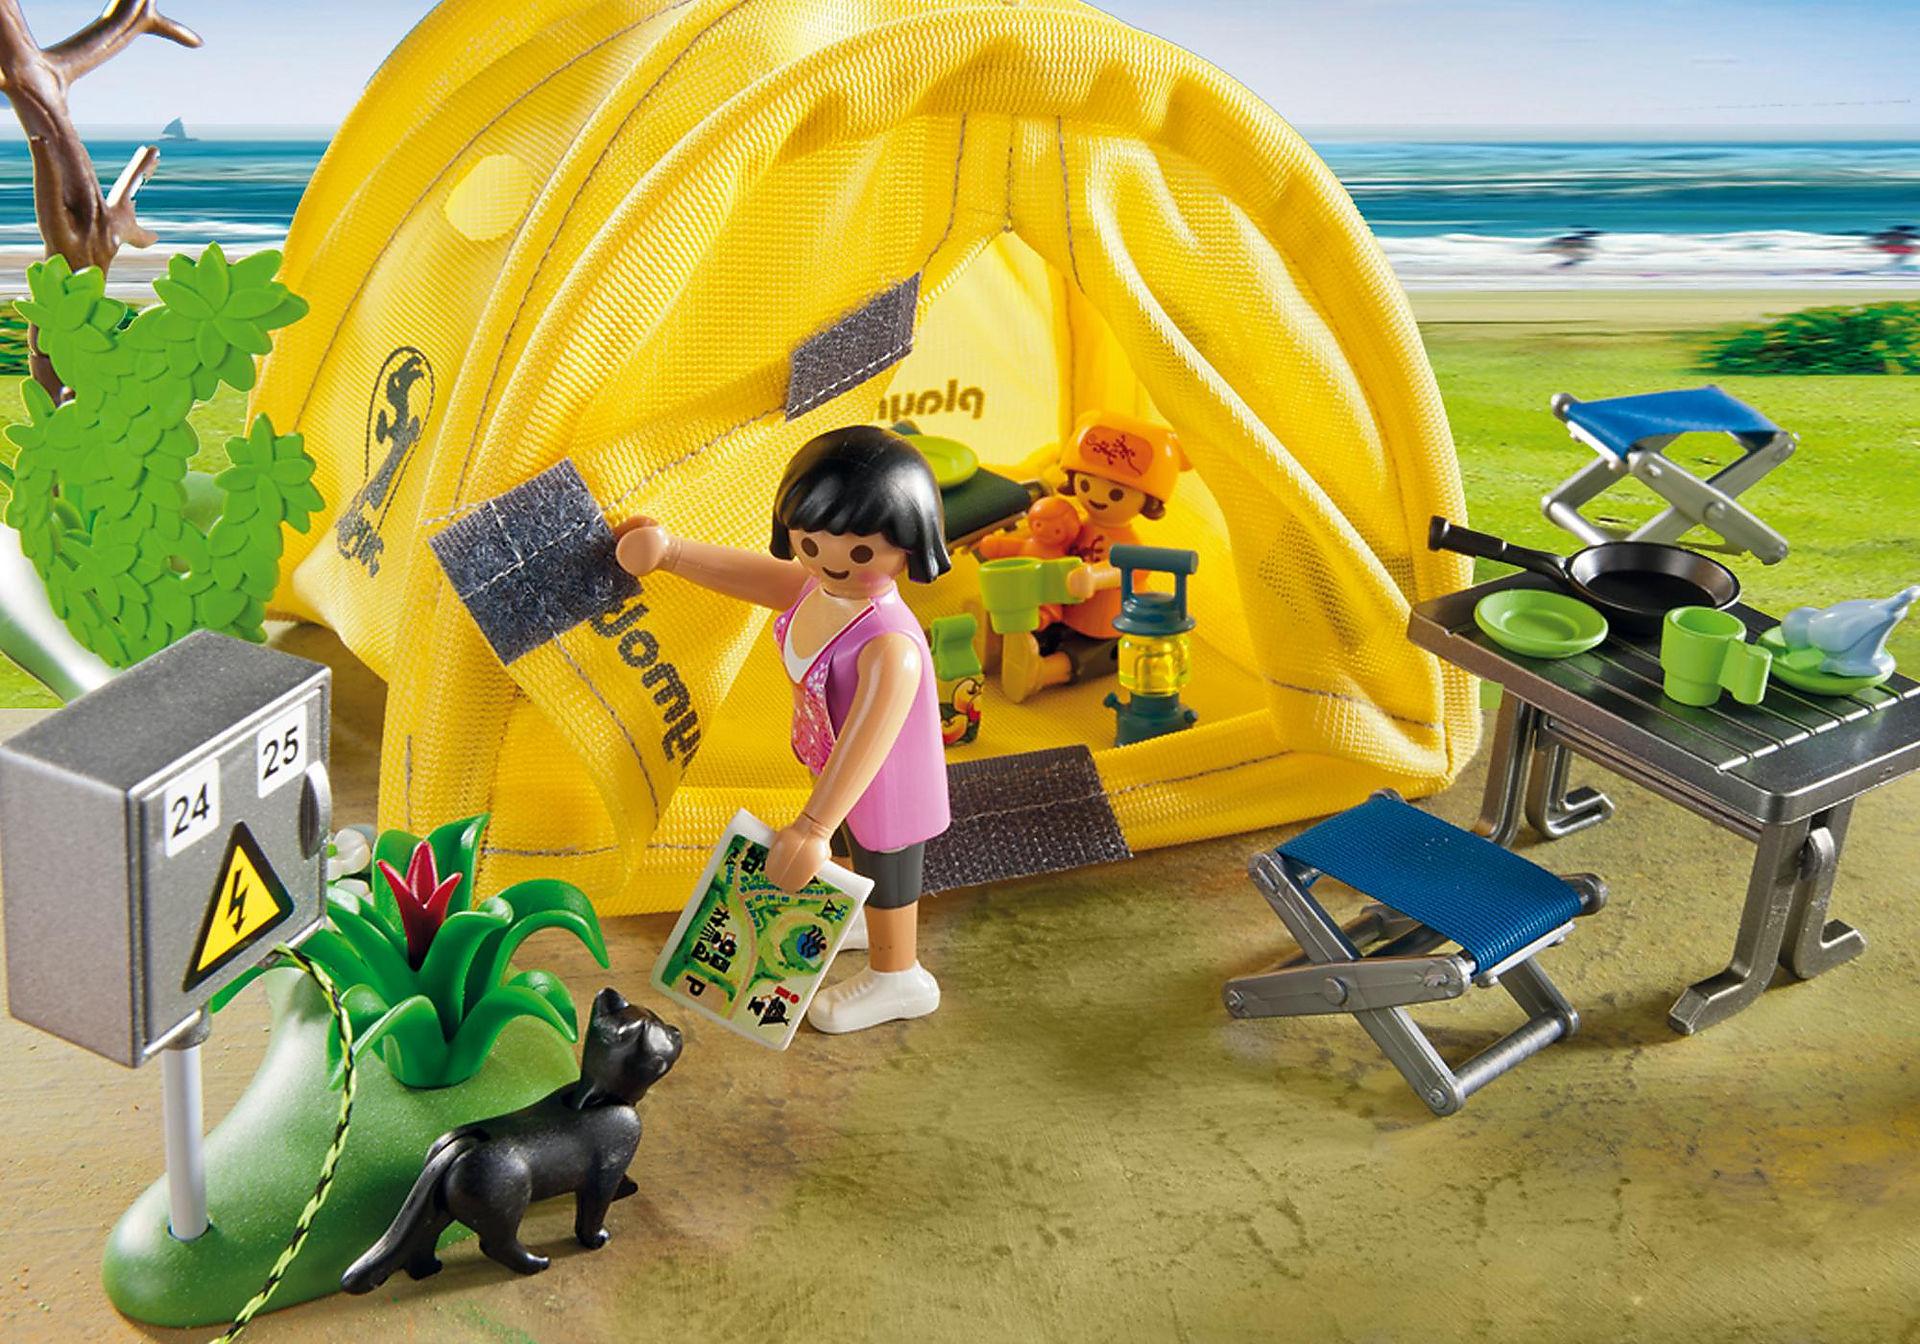 http://media.playmobil.com/i/playmobil/5435_product_extra1/Tienda de Campaña Familiar